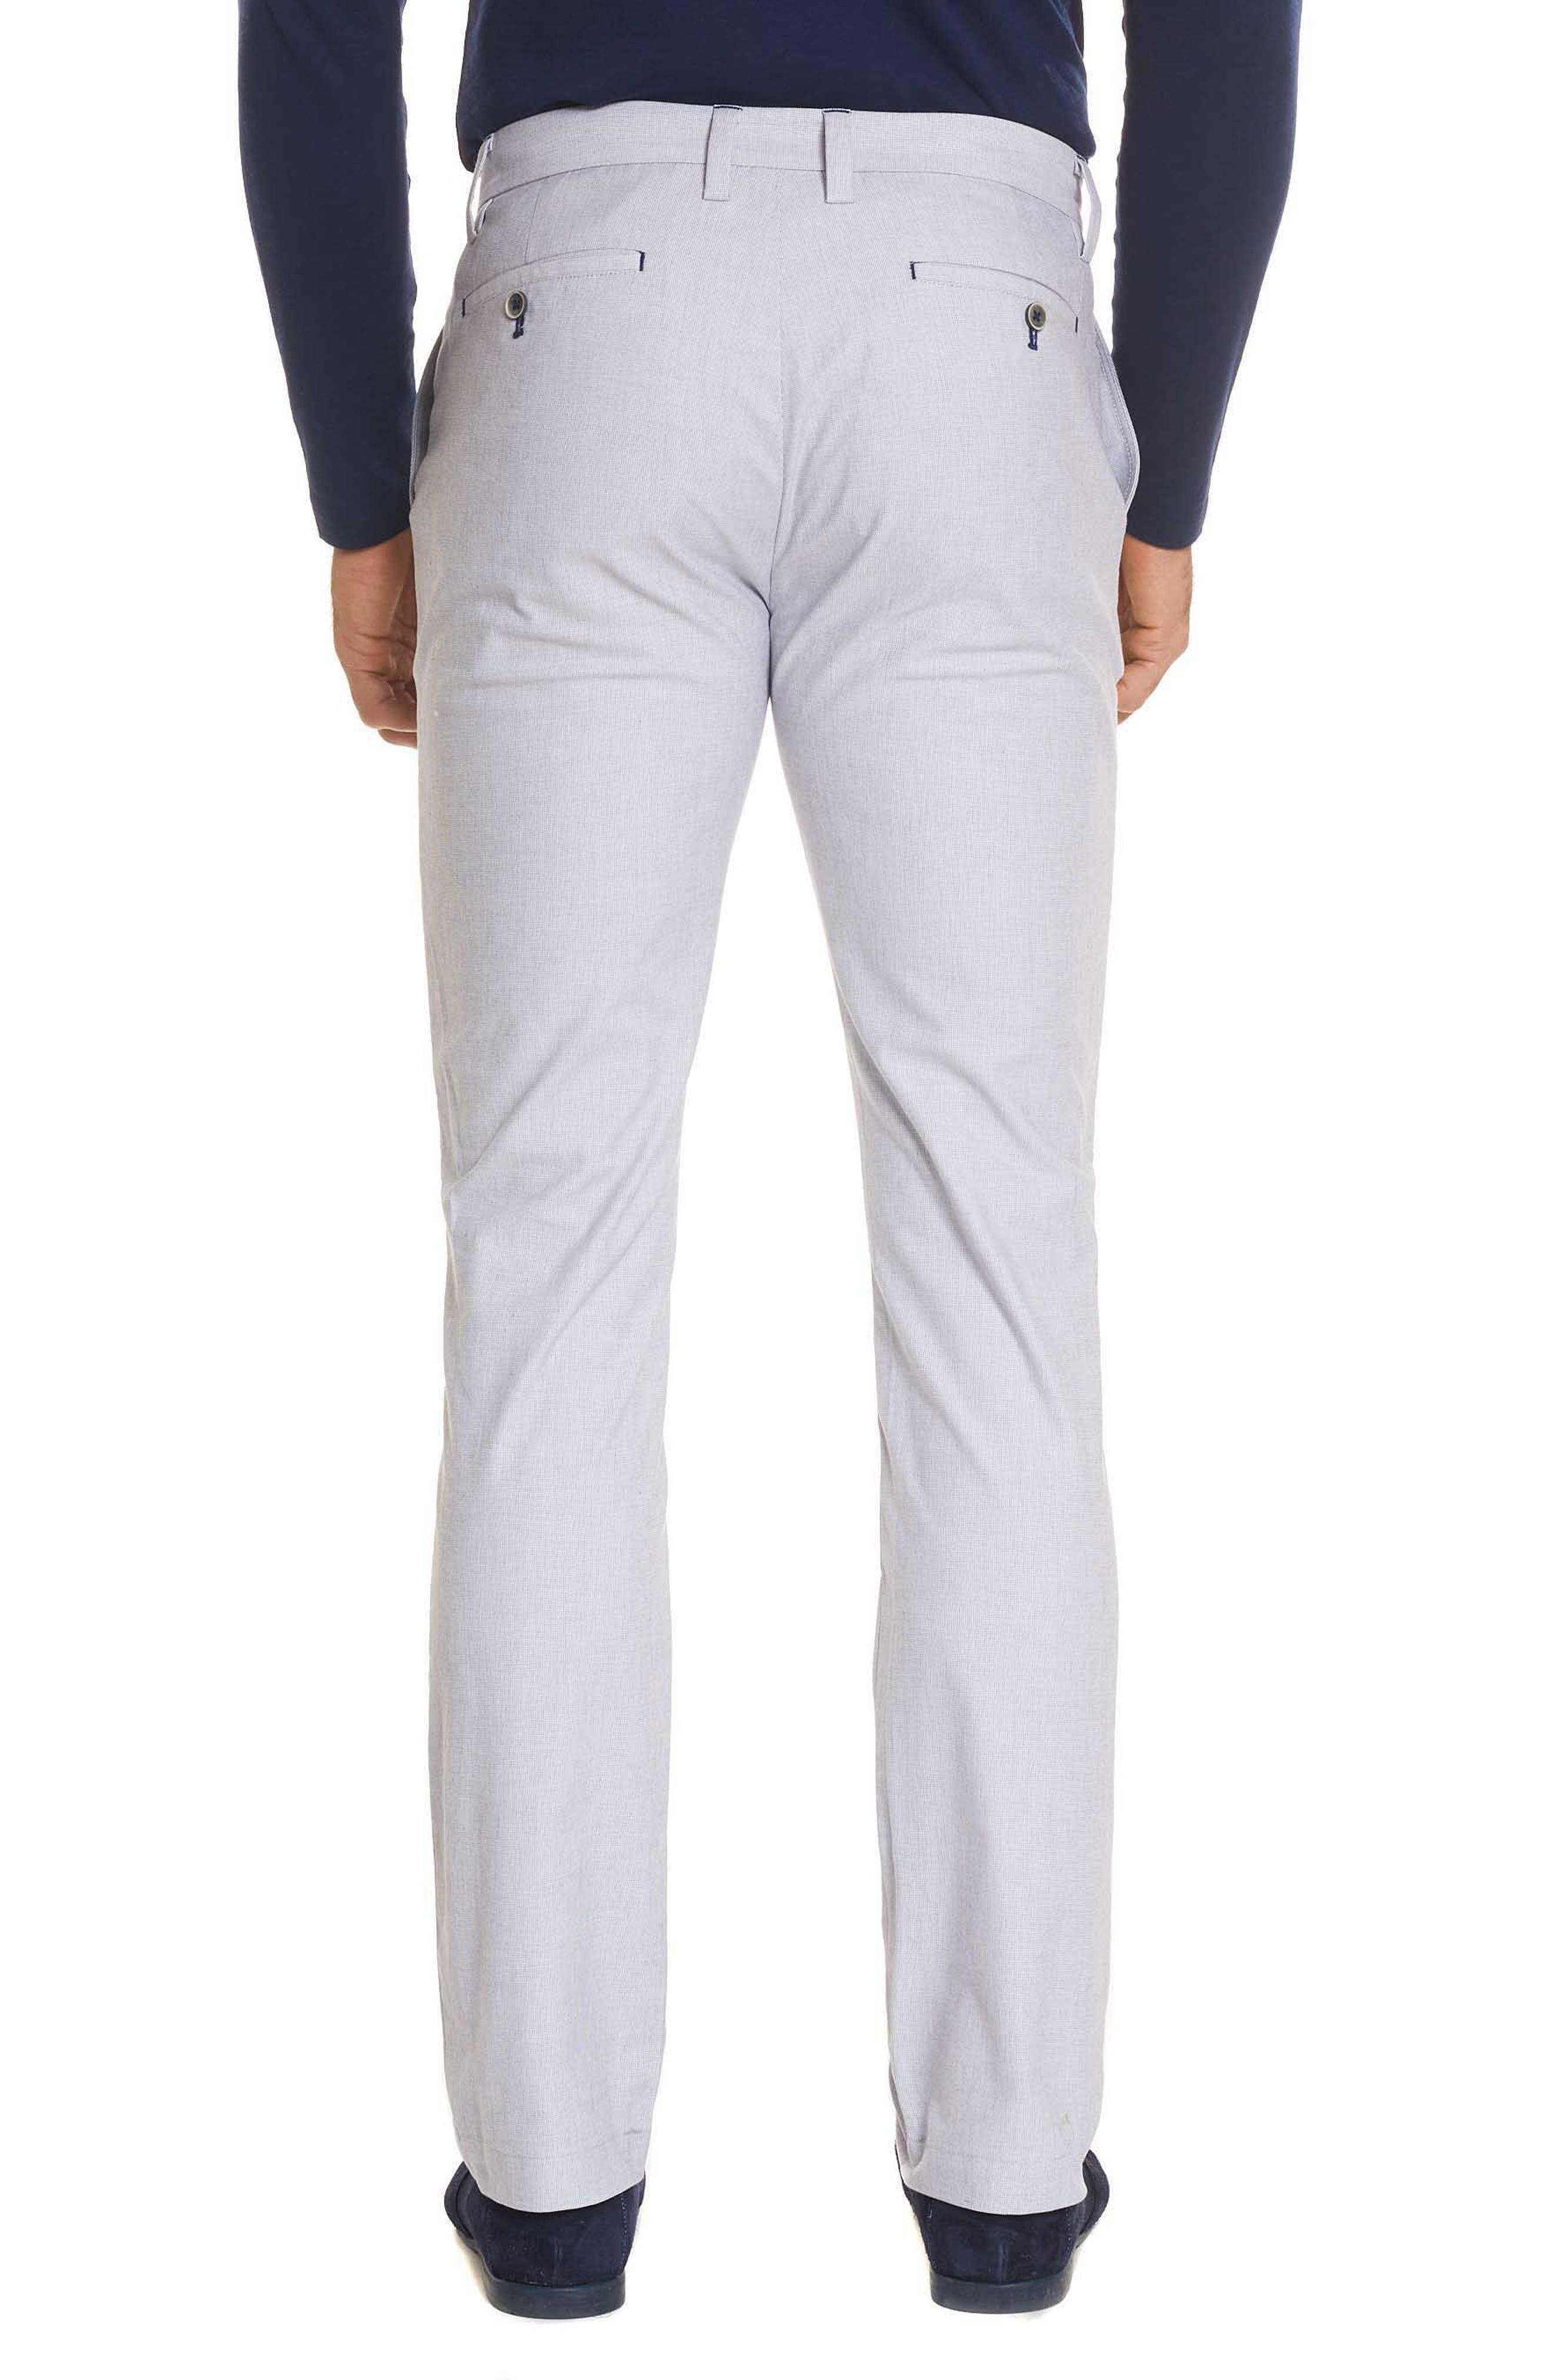 Gerardo Tailored Fit Pants,                             Alternate thumbnail 2, color,                             100